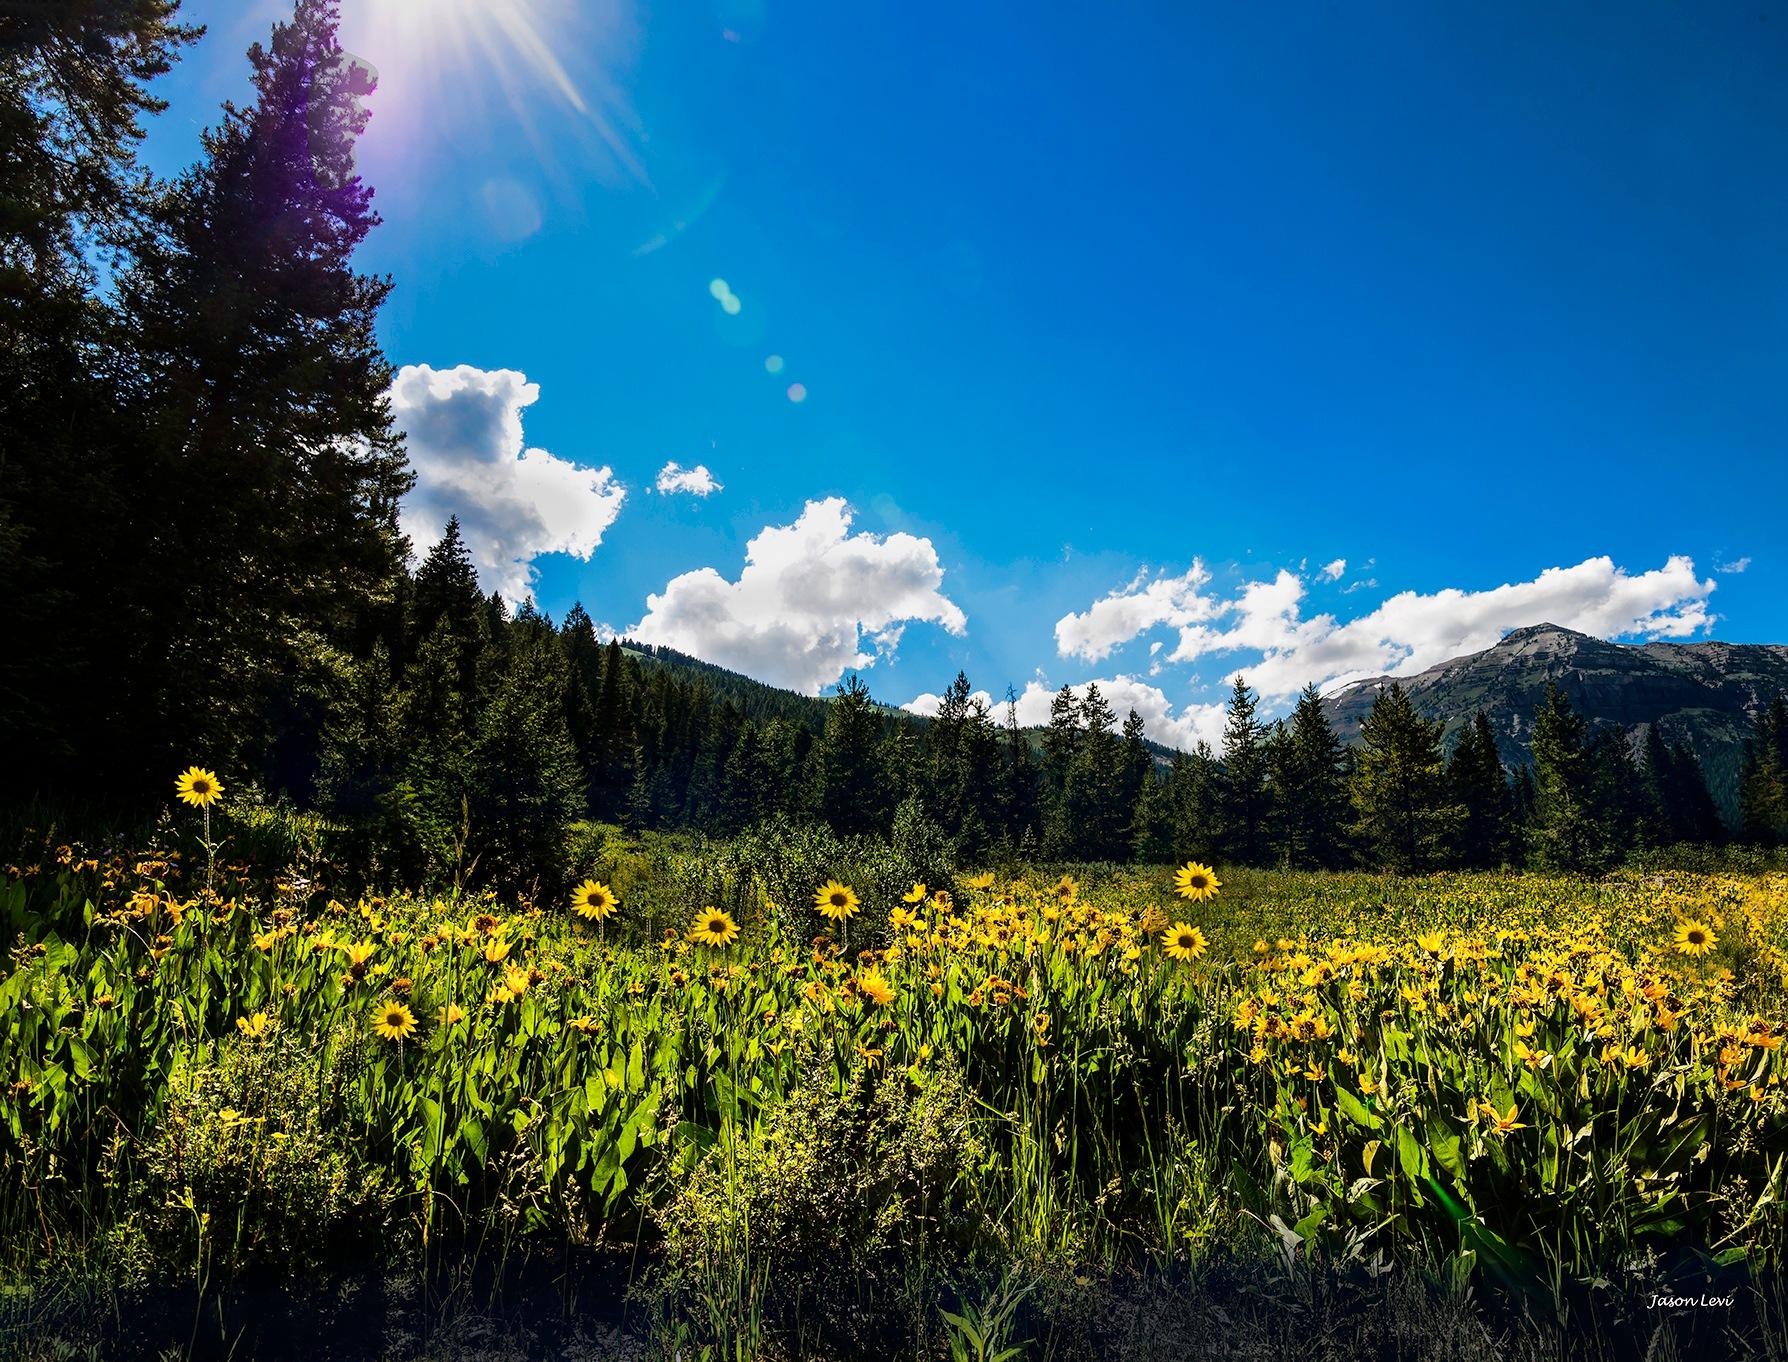 The Field by Jason Levi